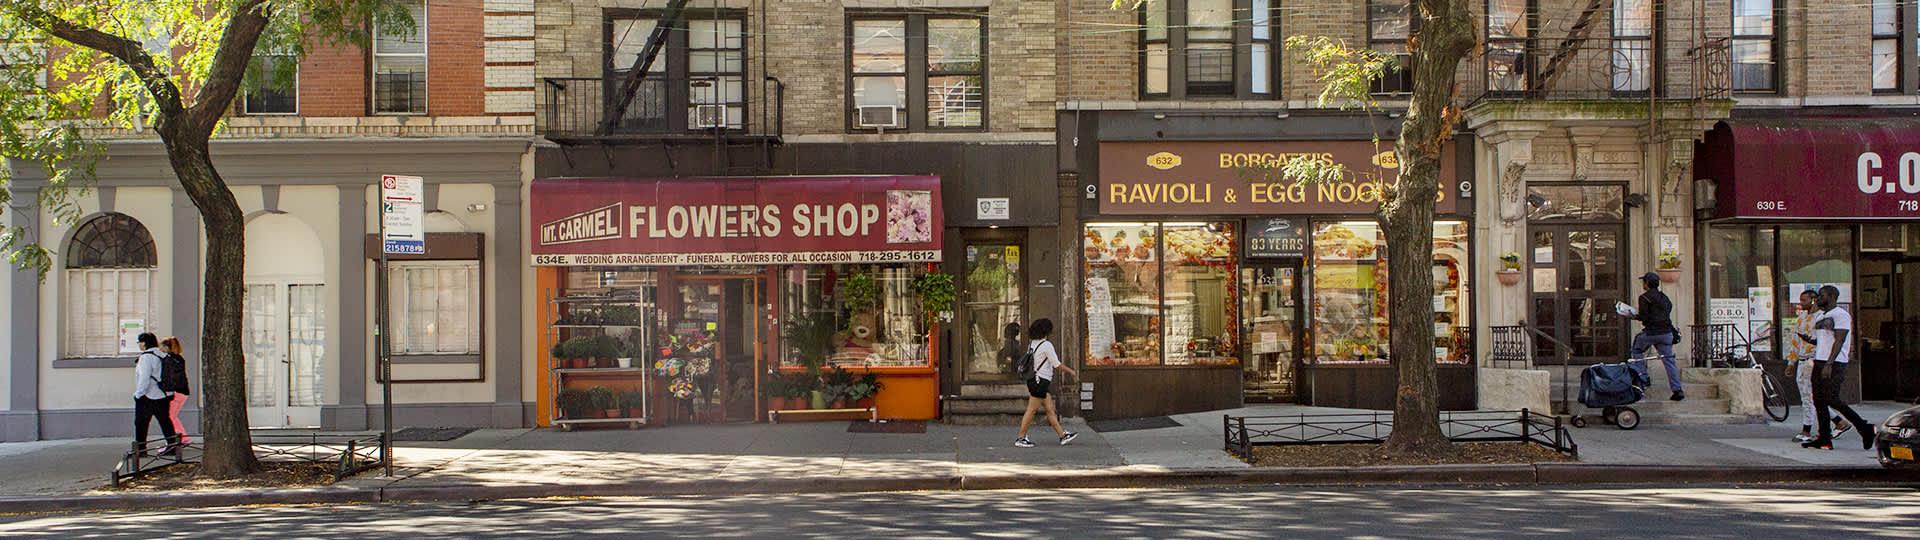 Arthur Ave, Belmont, Bronx